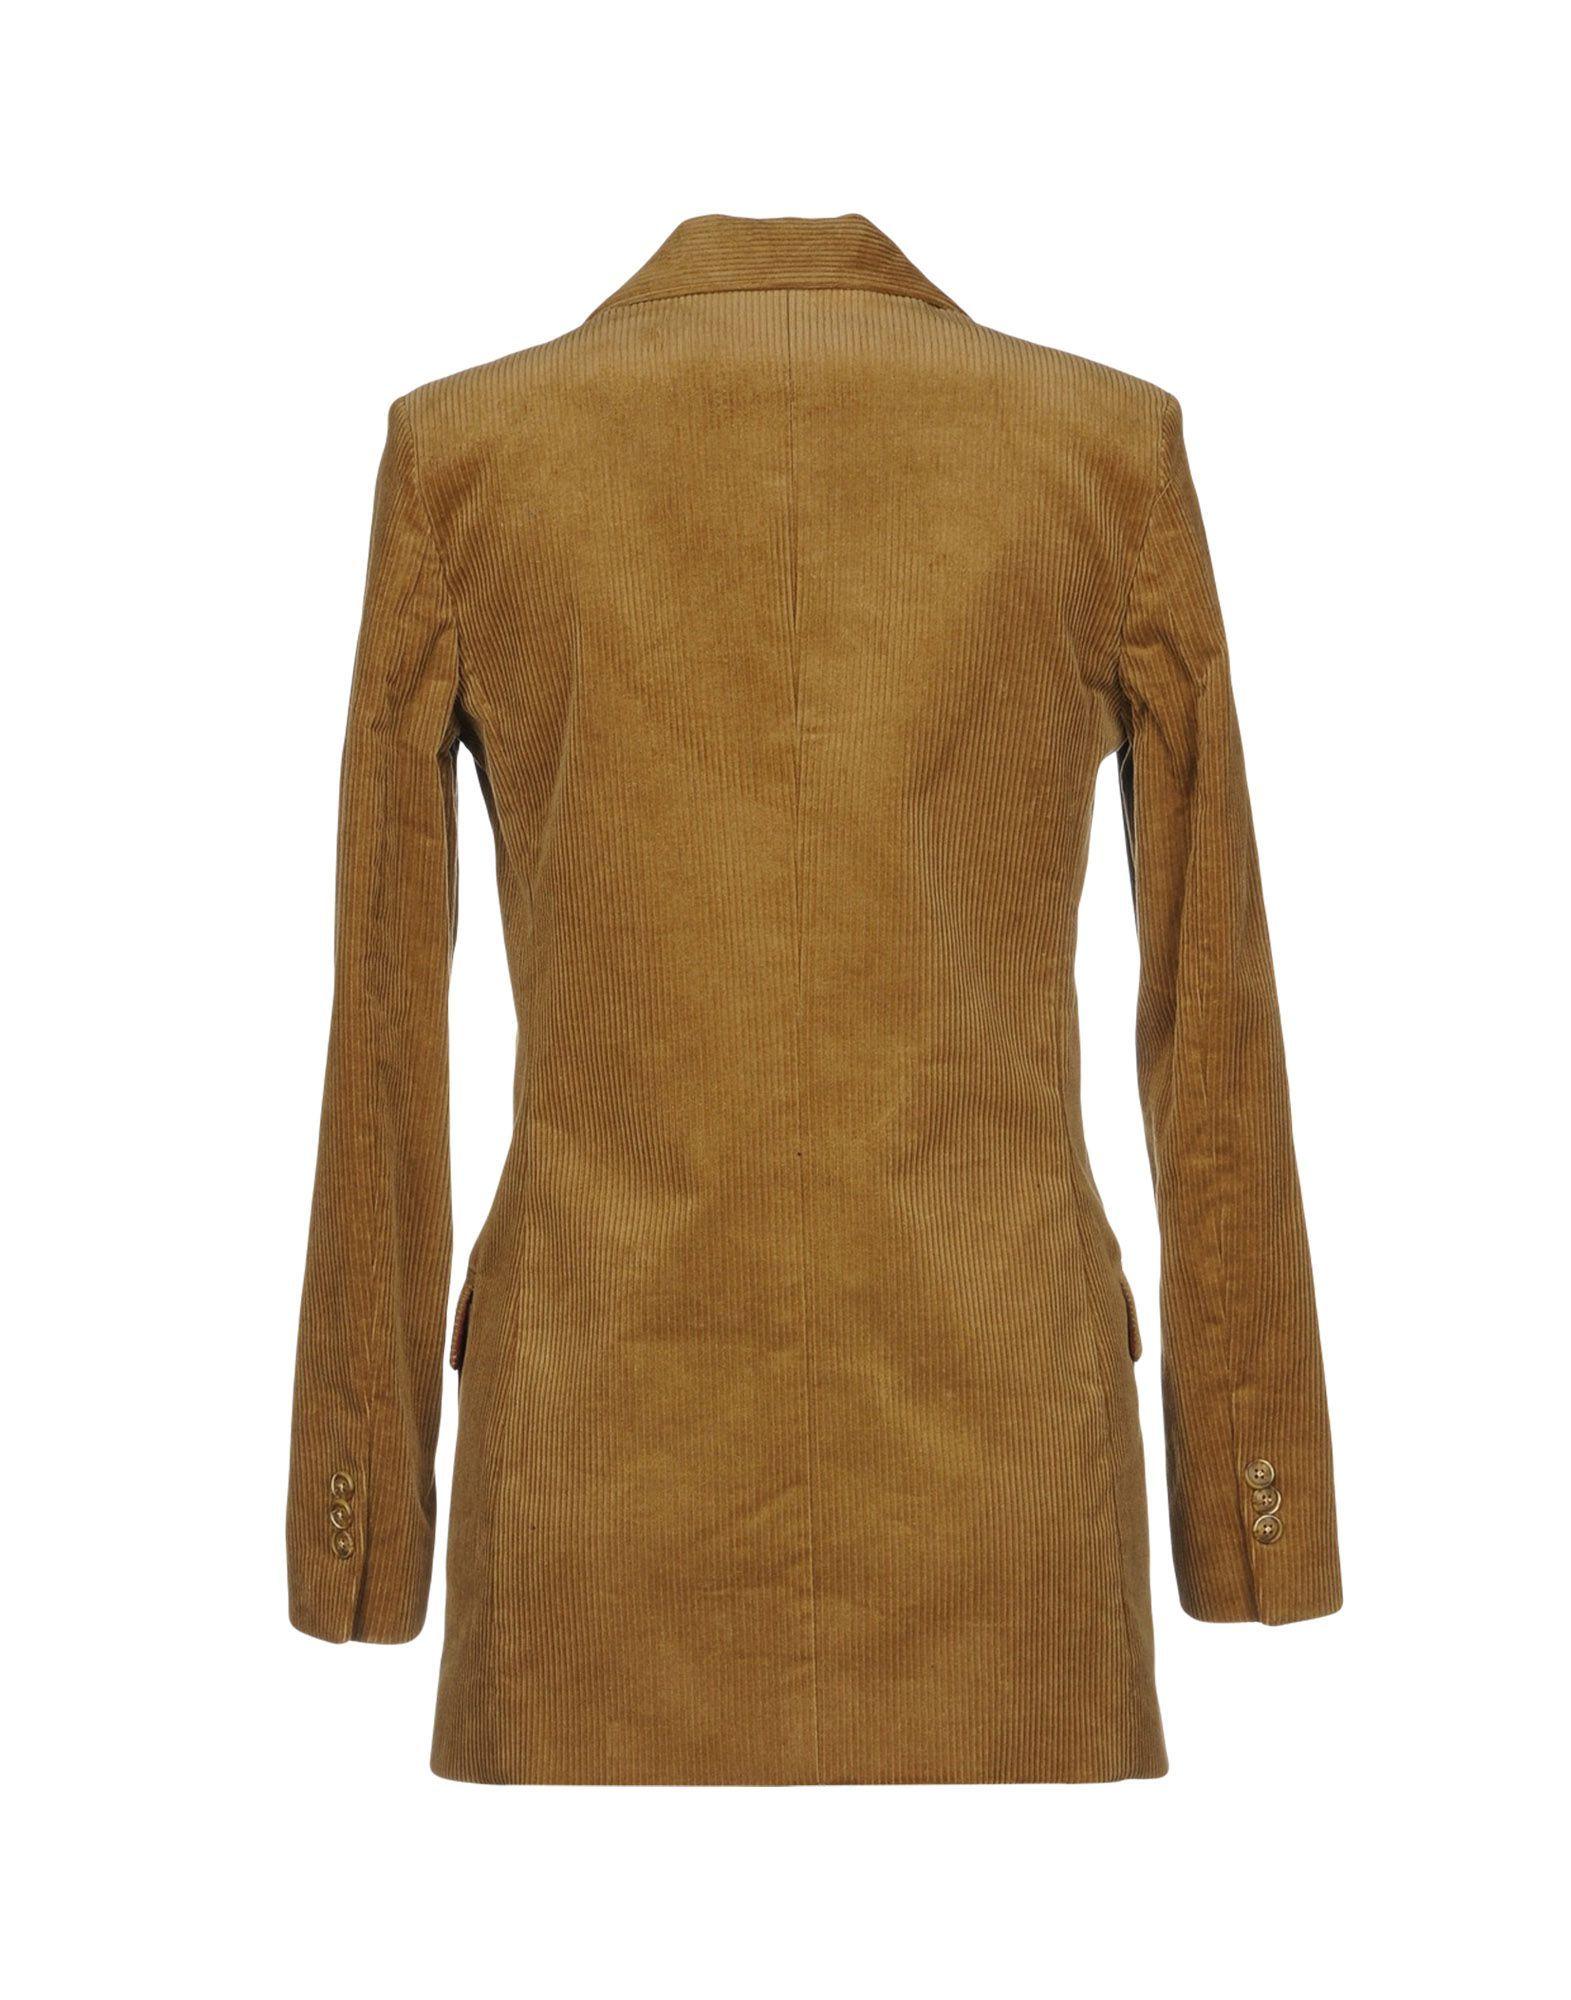 Vicolo Beige Cotton Velvet Double Breasted Jacket